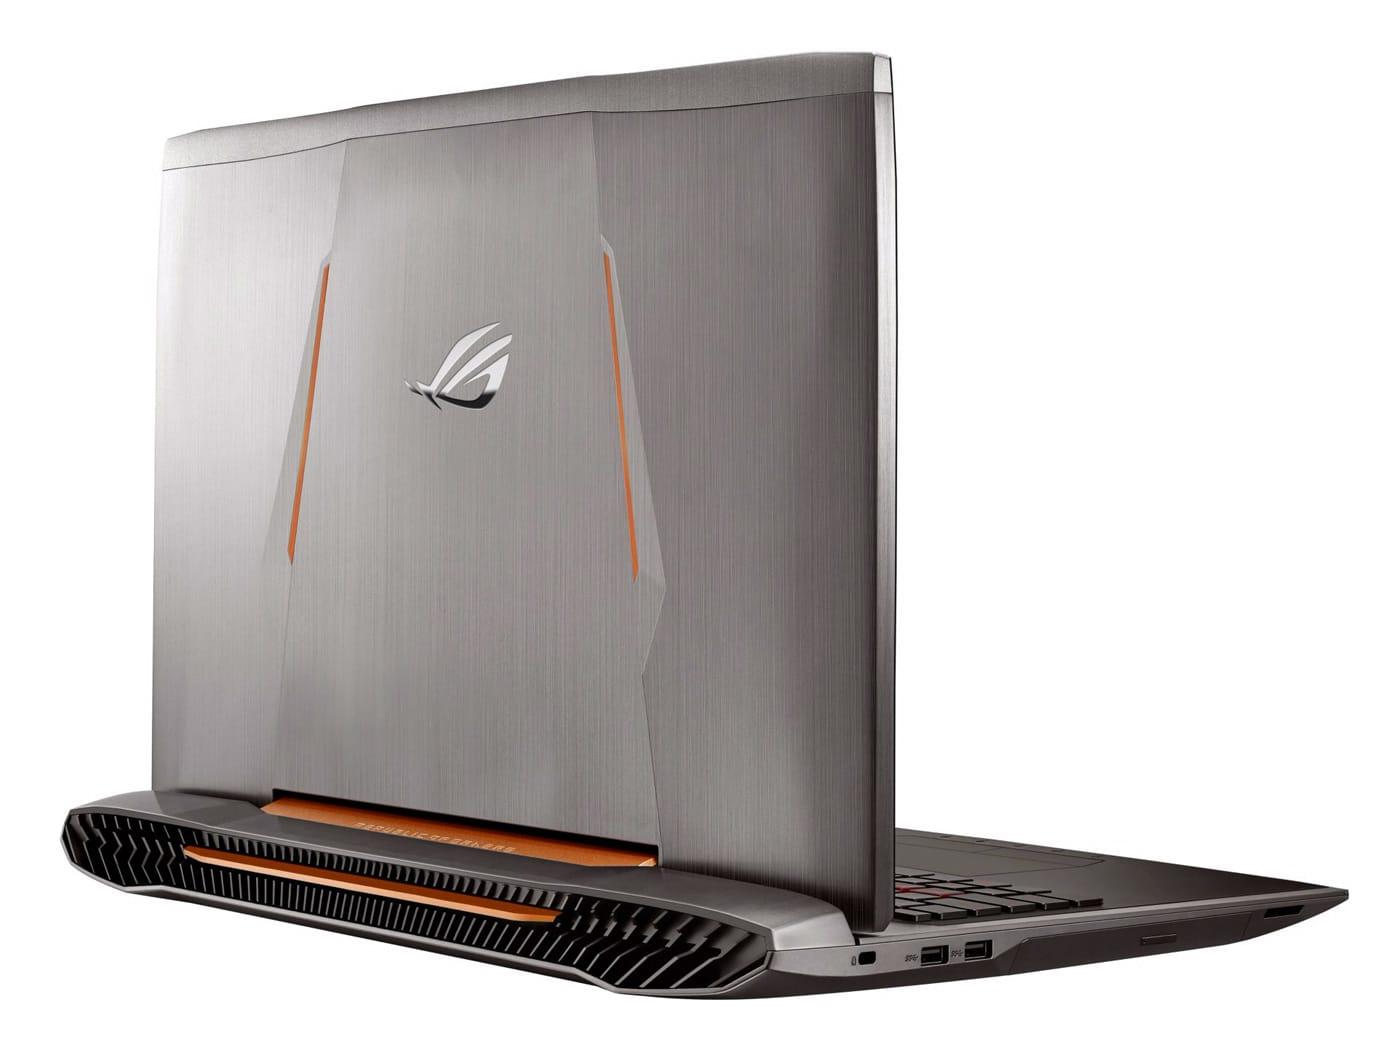 "<span class=""tagtitre"">Promo 2169€ - </span>Asus G752VS-GC122T, PC portable 17 pouces GTX 1070 SSD i7"